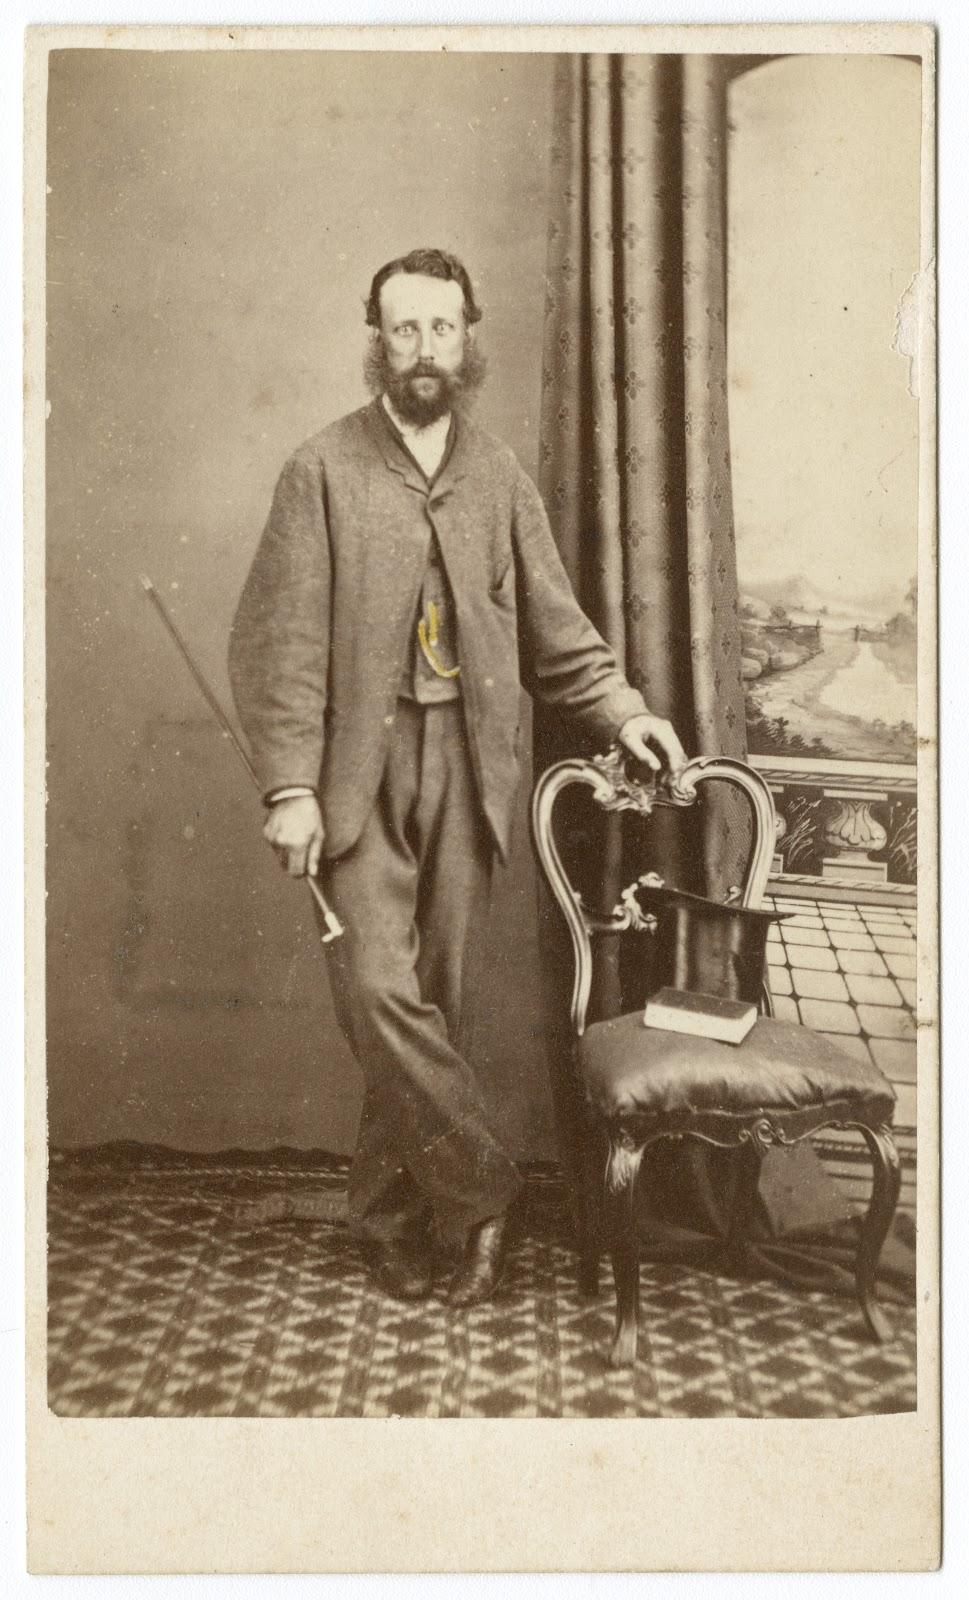 Alfred Barrett Biggs, photo by T. J. Nevin ca. 1874